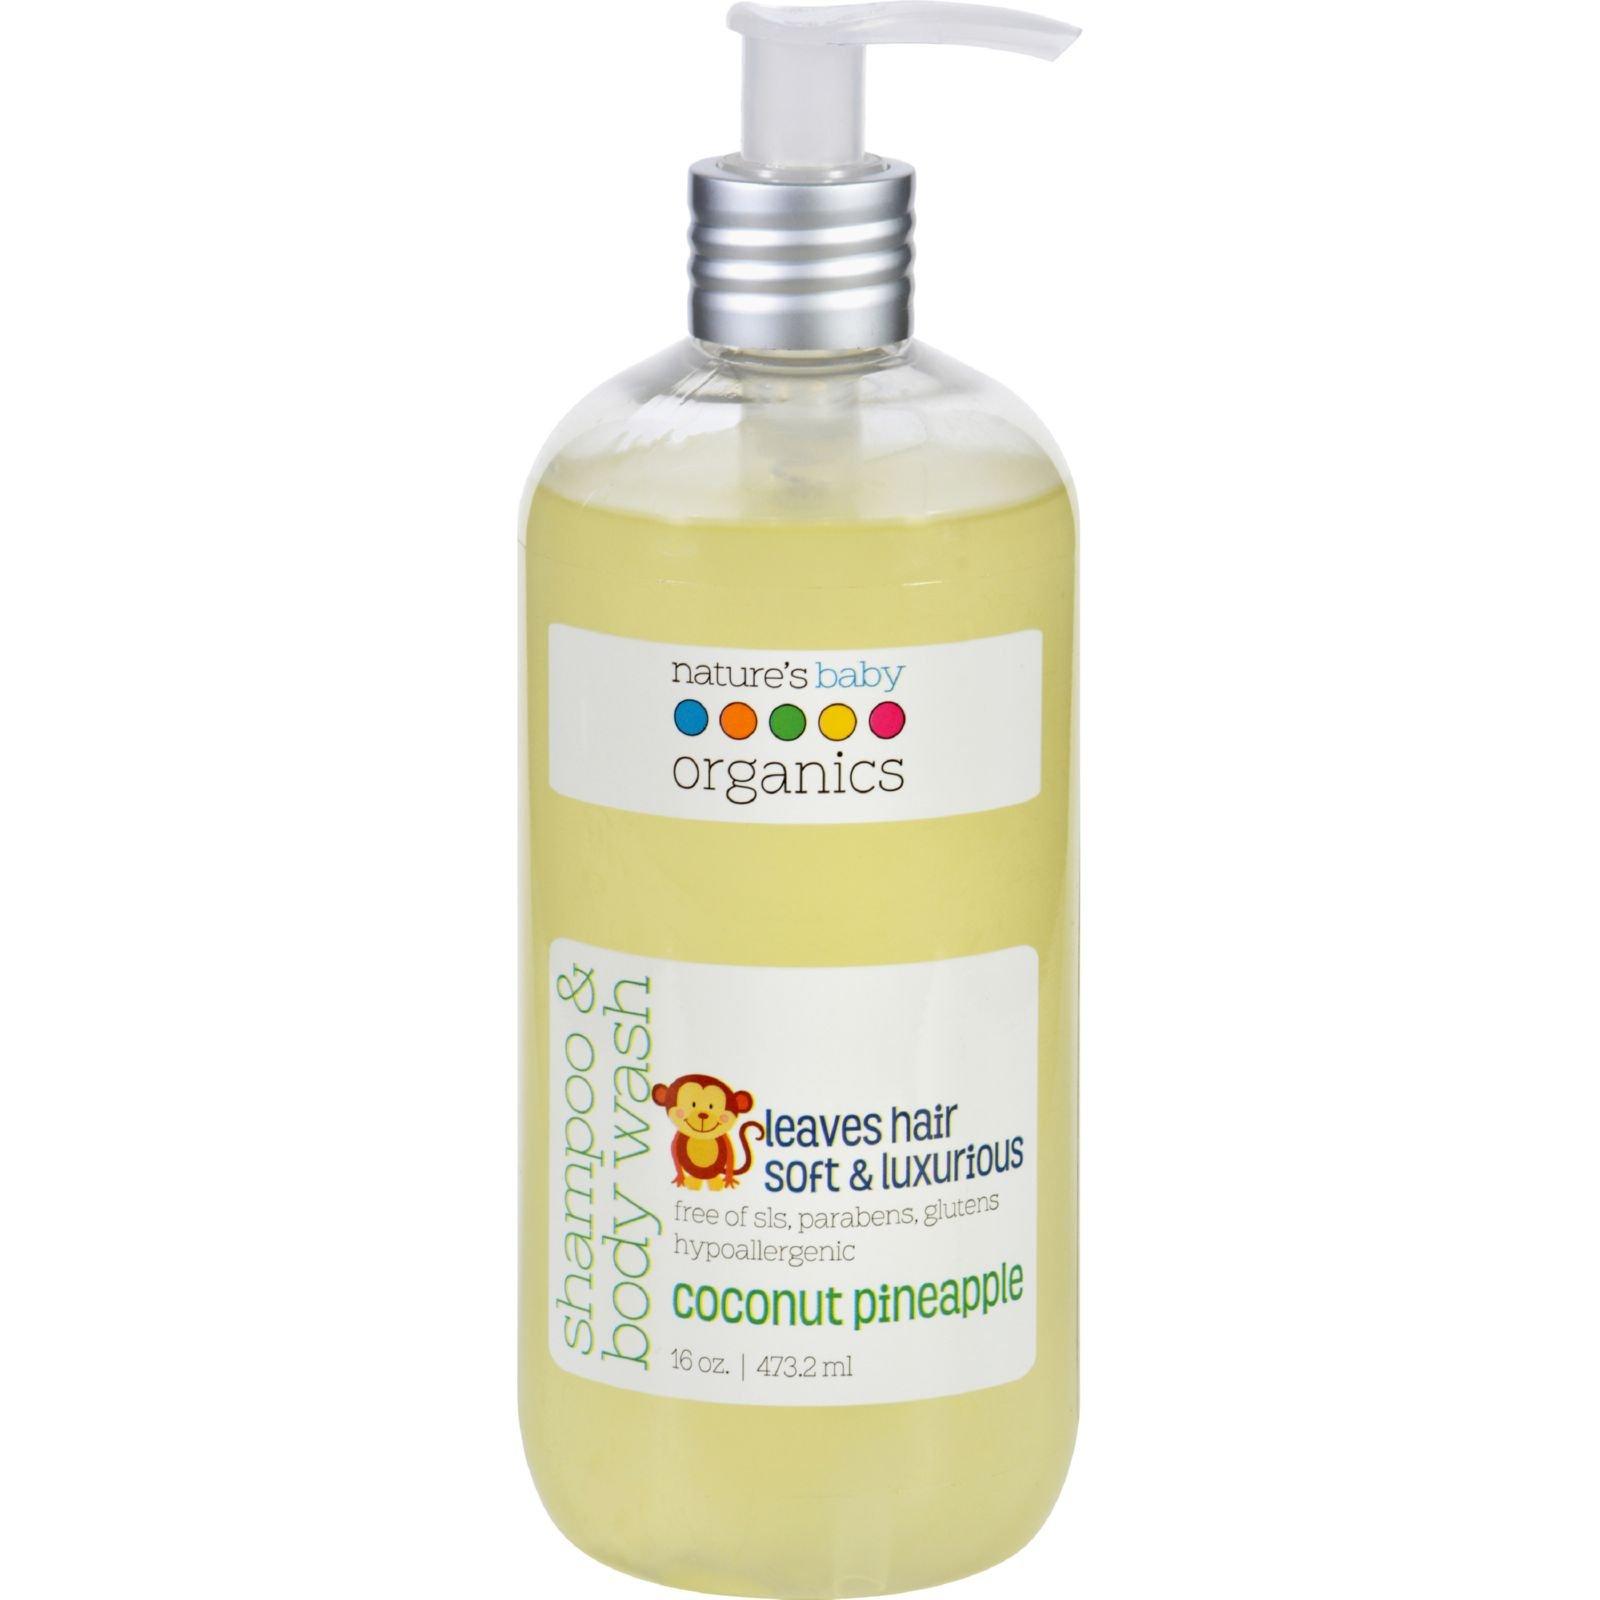 Natures Baby Organics Shampoo and Body Wash - Coconut Pienapple - 16 oz - Gluten Free - by Nature's Baby Organics